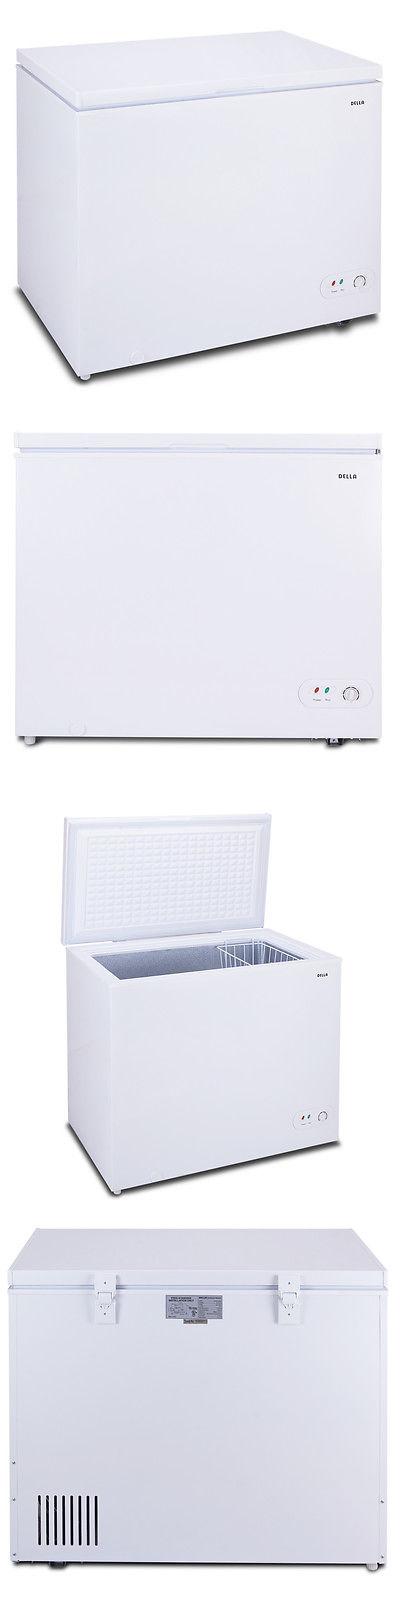 Refrigerators New Chest Deep Freezer Cu Ft Size Compact